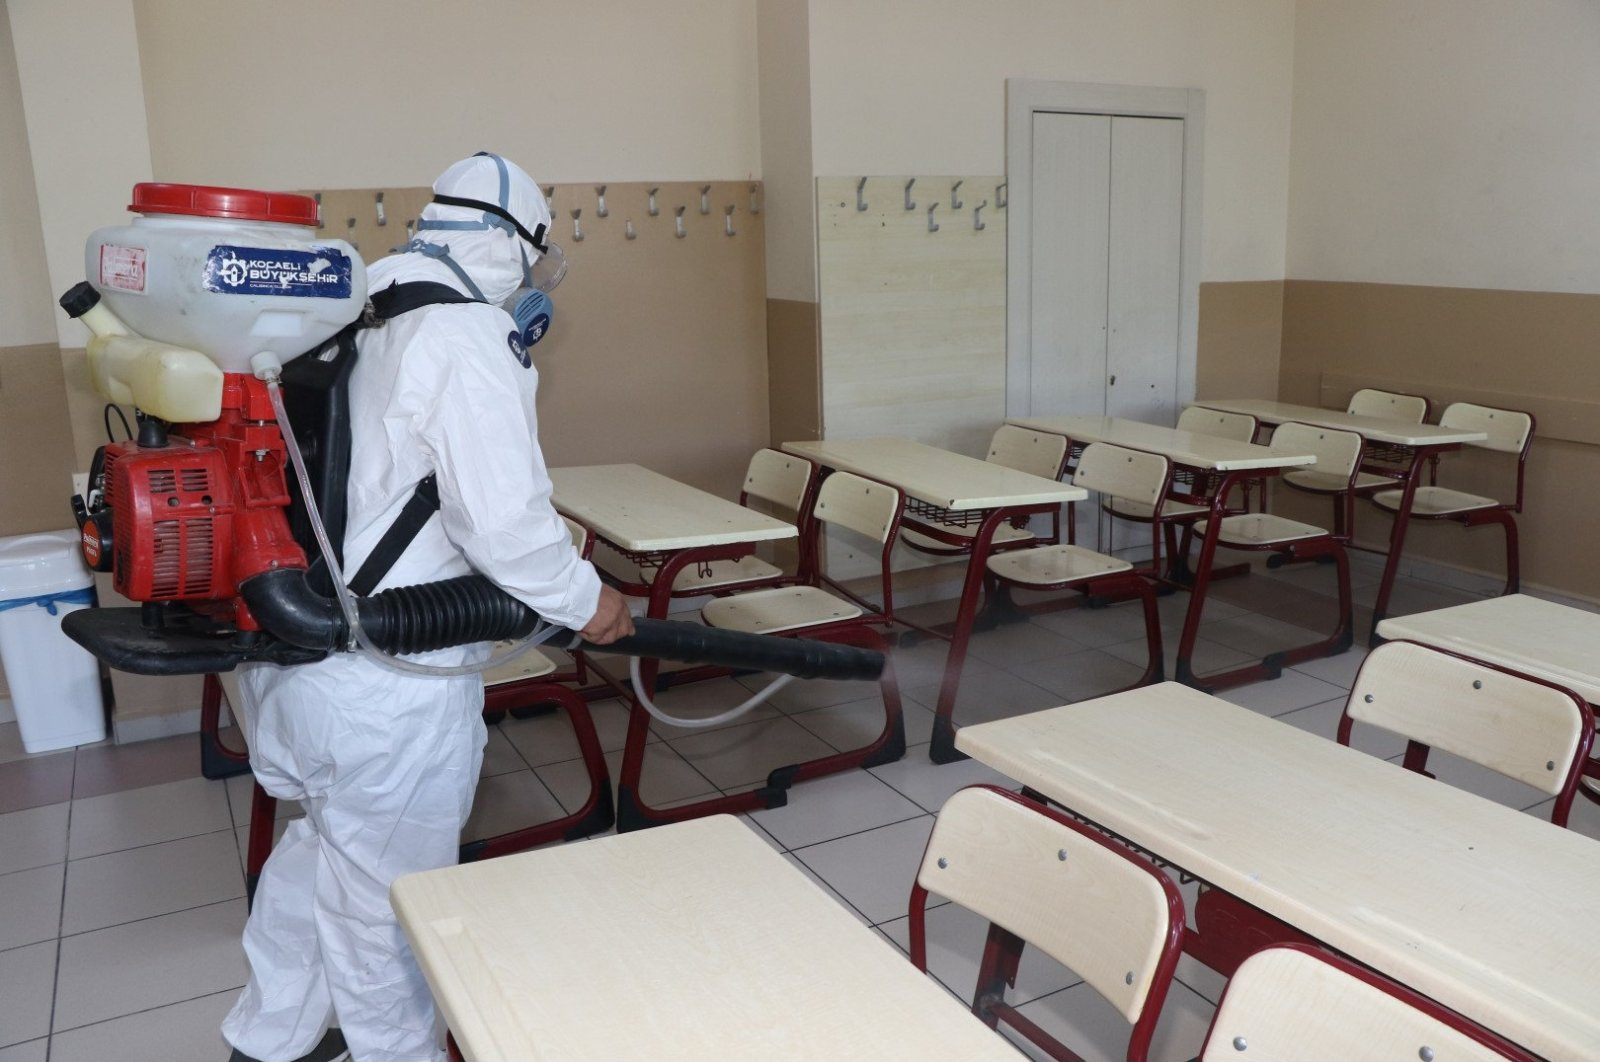 A worker disinfects a school in Kocaeli, northwestern Turkey, Jun. 26, 2020. (AA Photo)